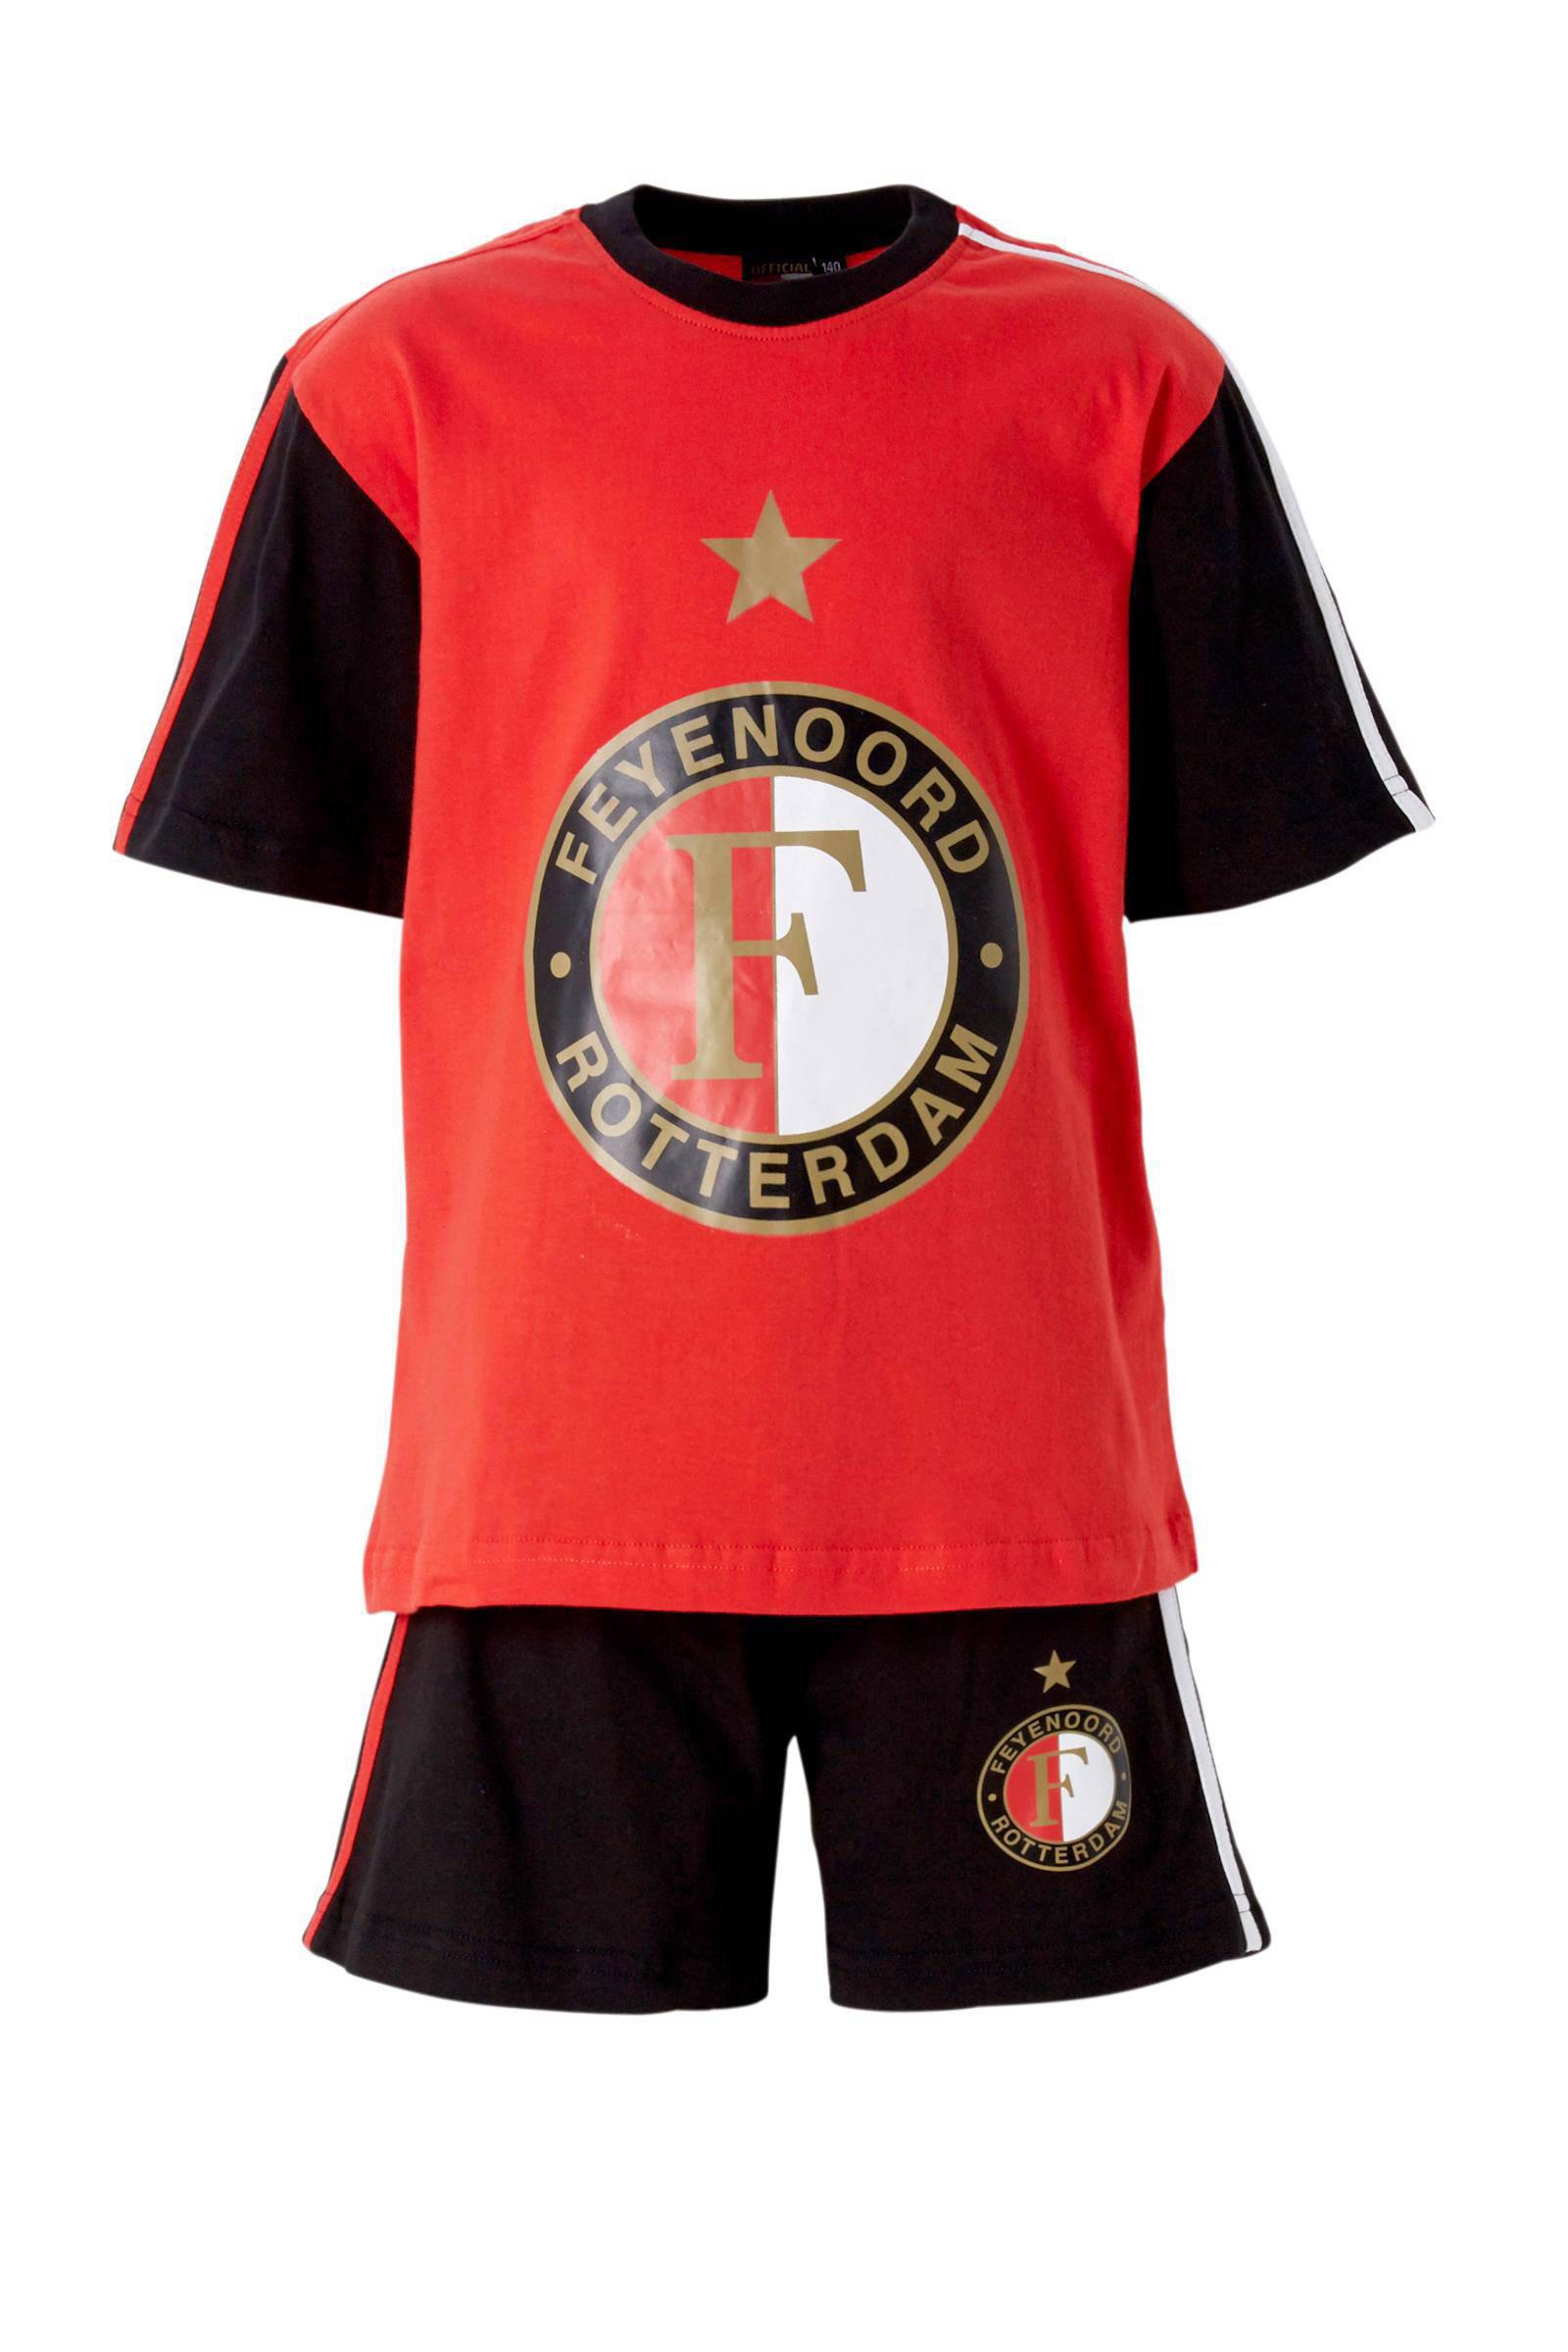 Feyenoord shortama   wehkamp